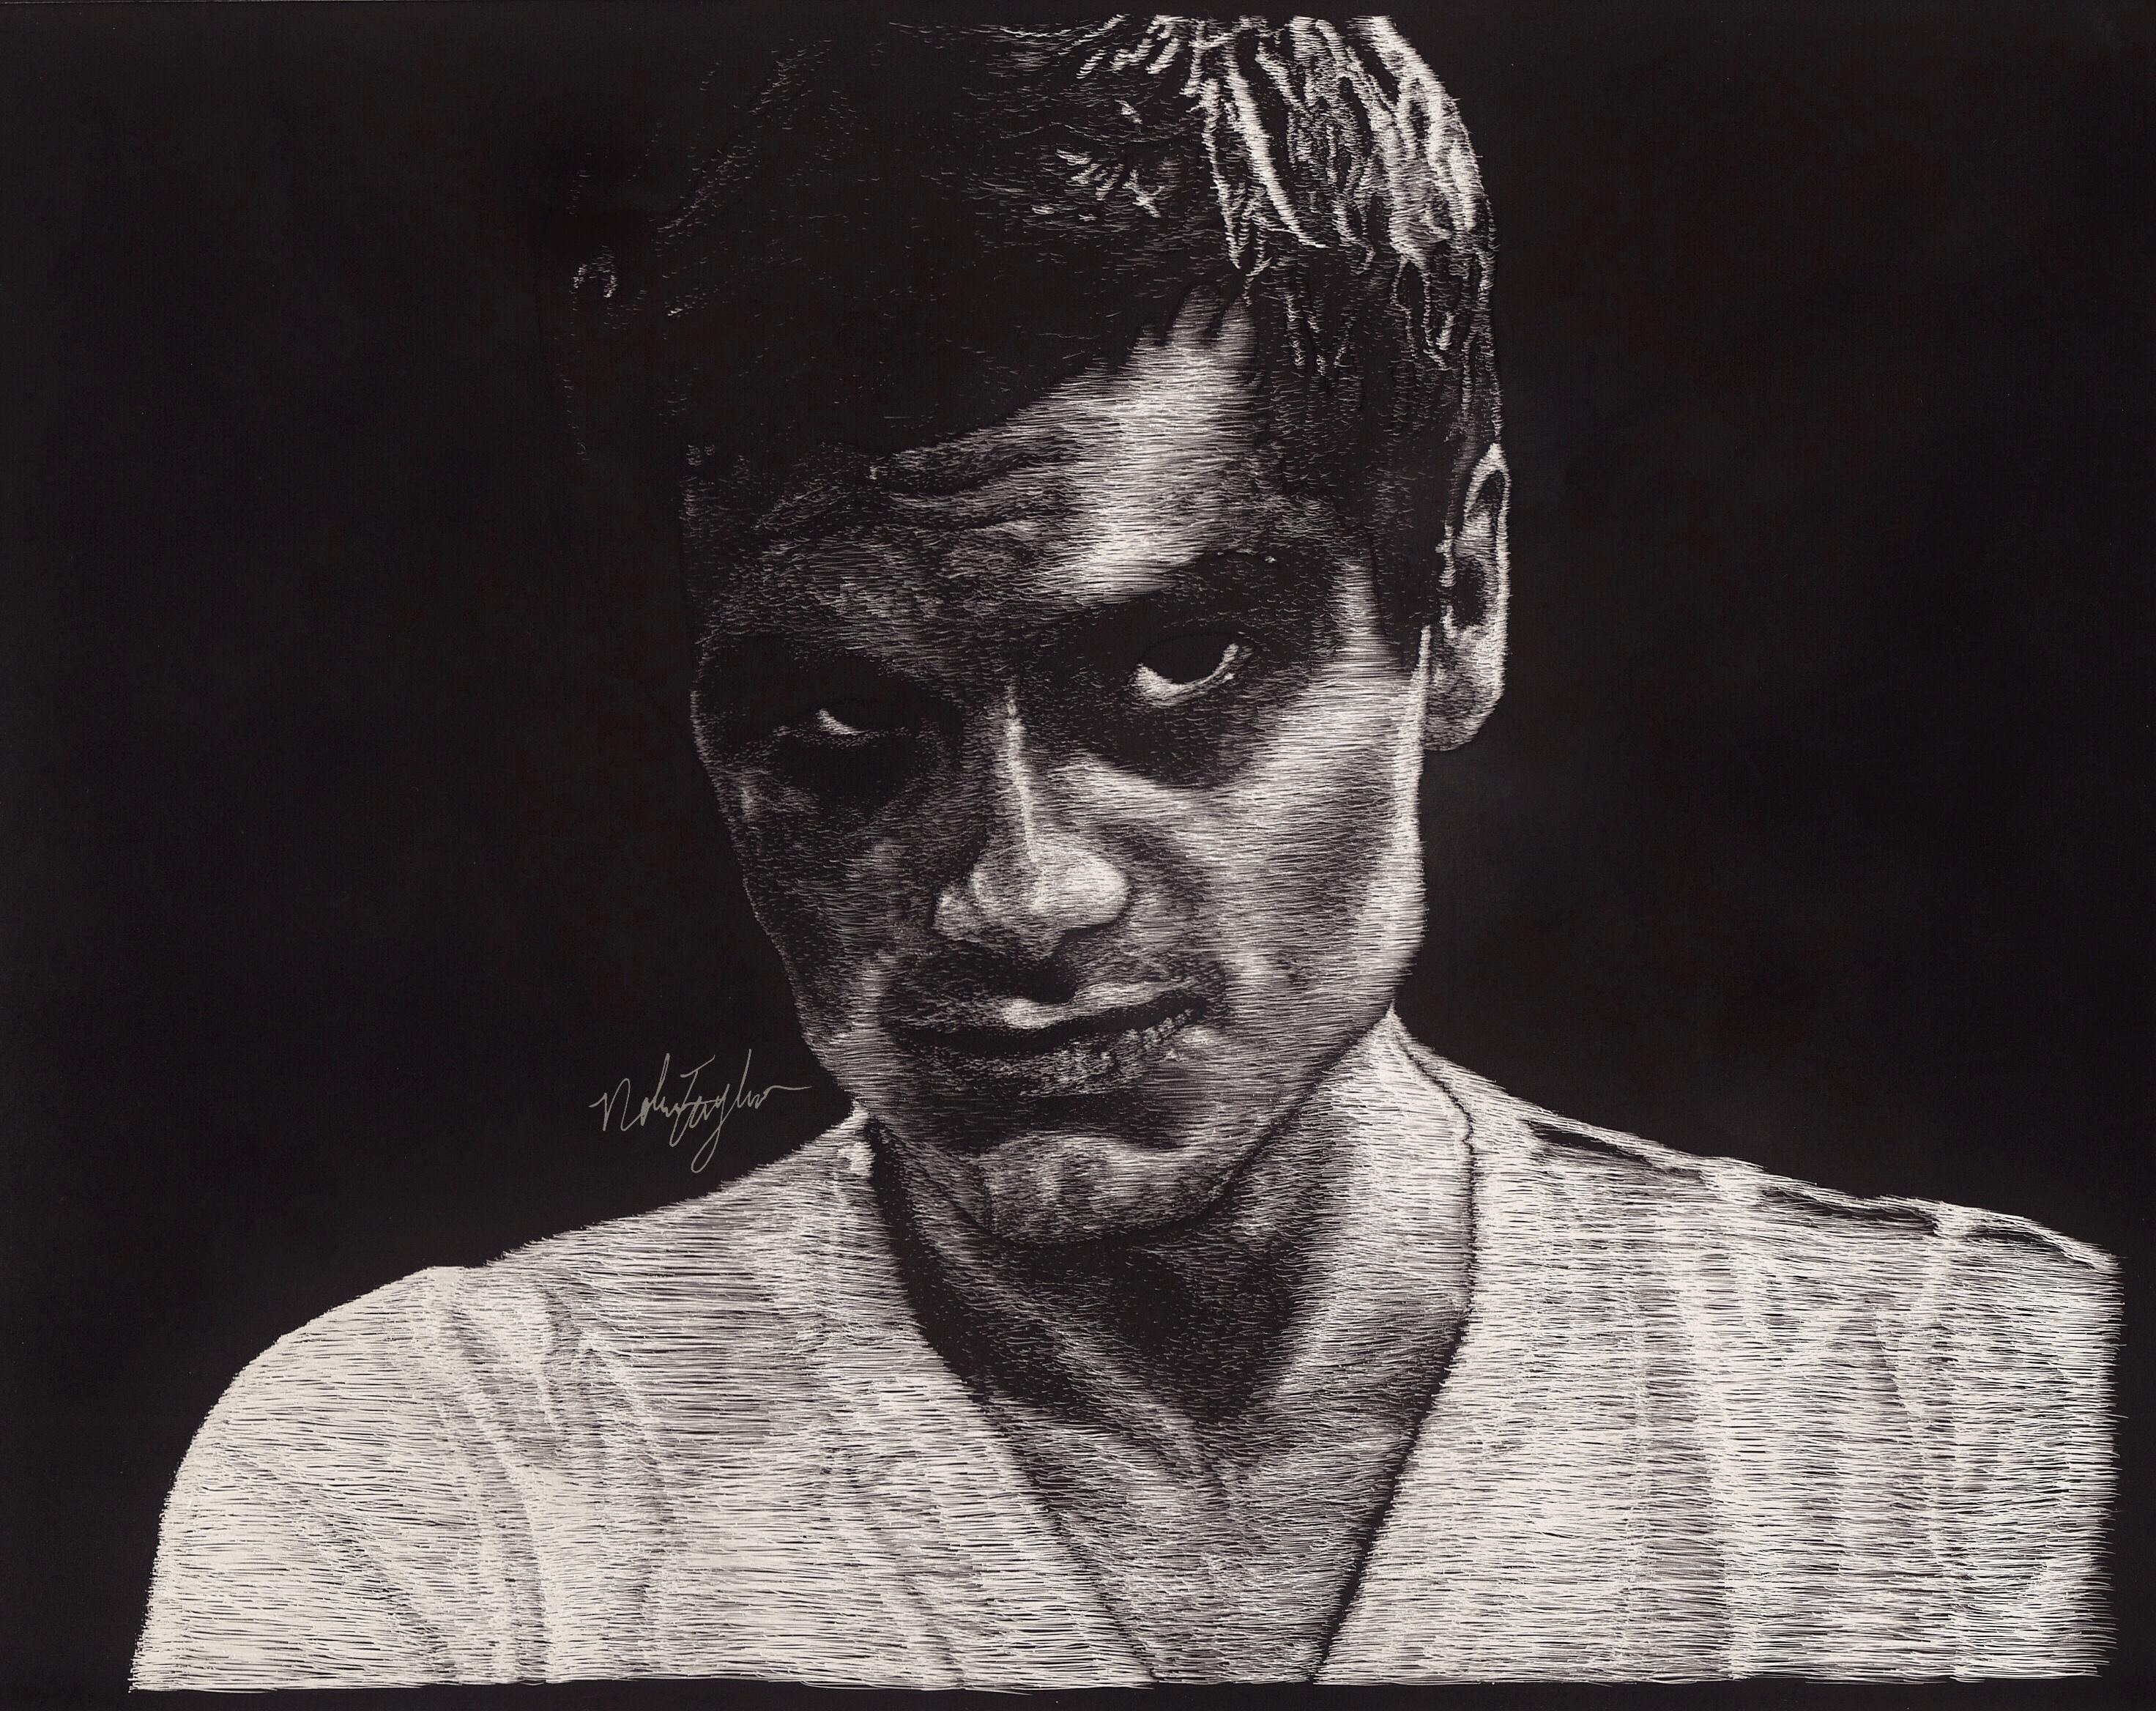 Nolan Taylor